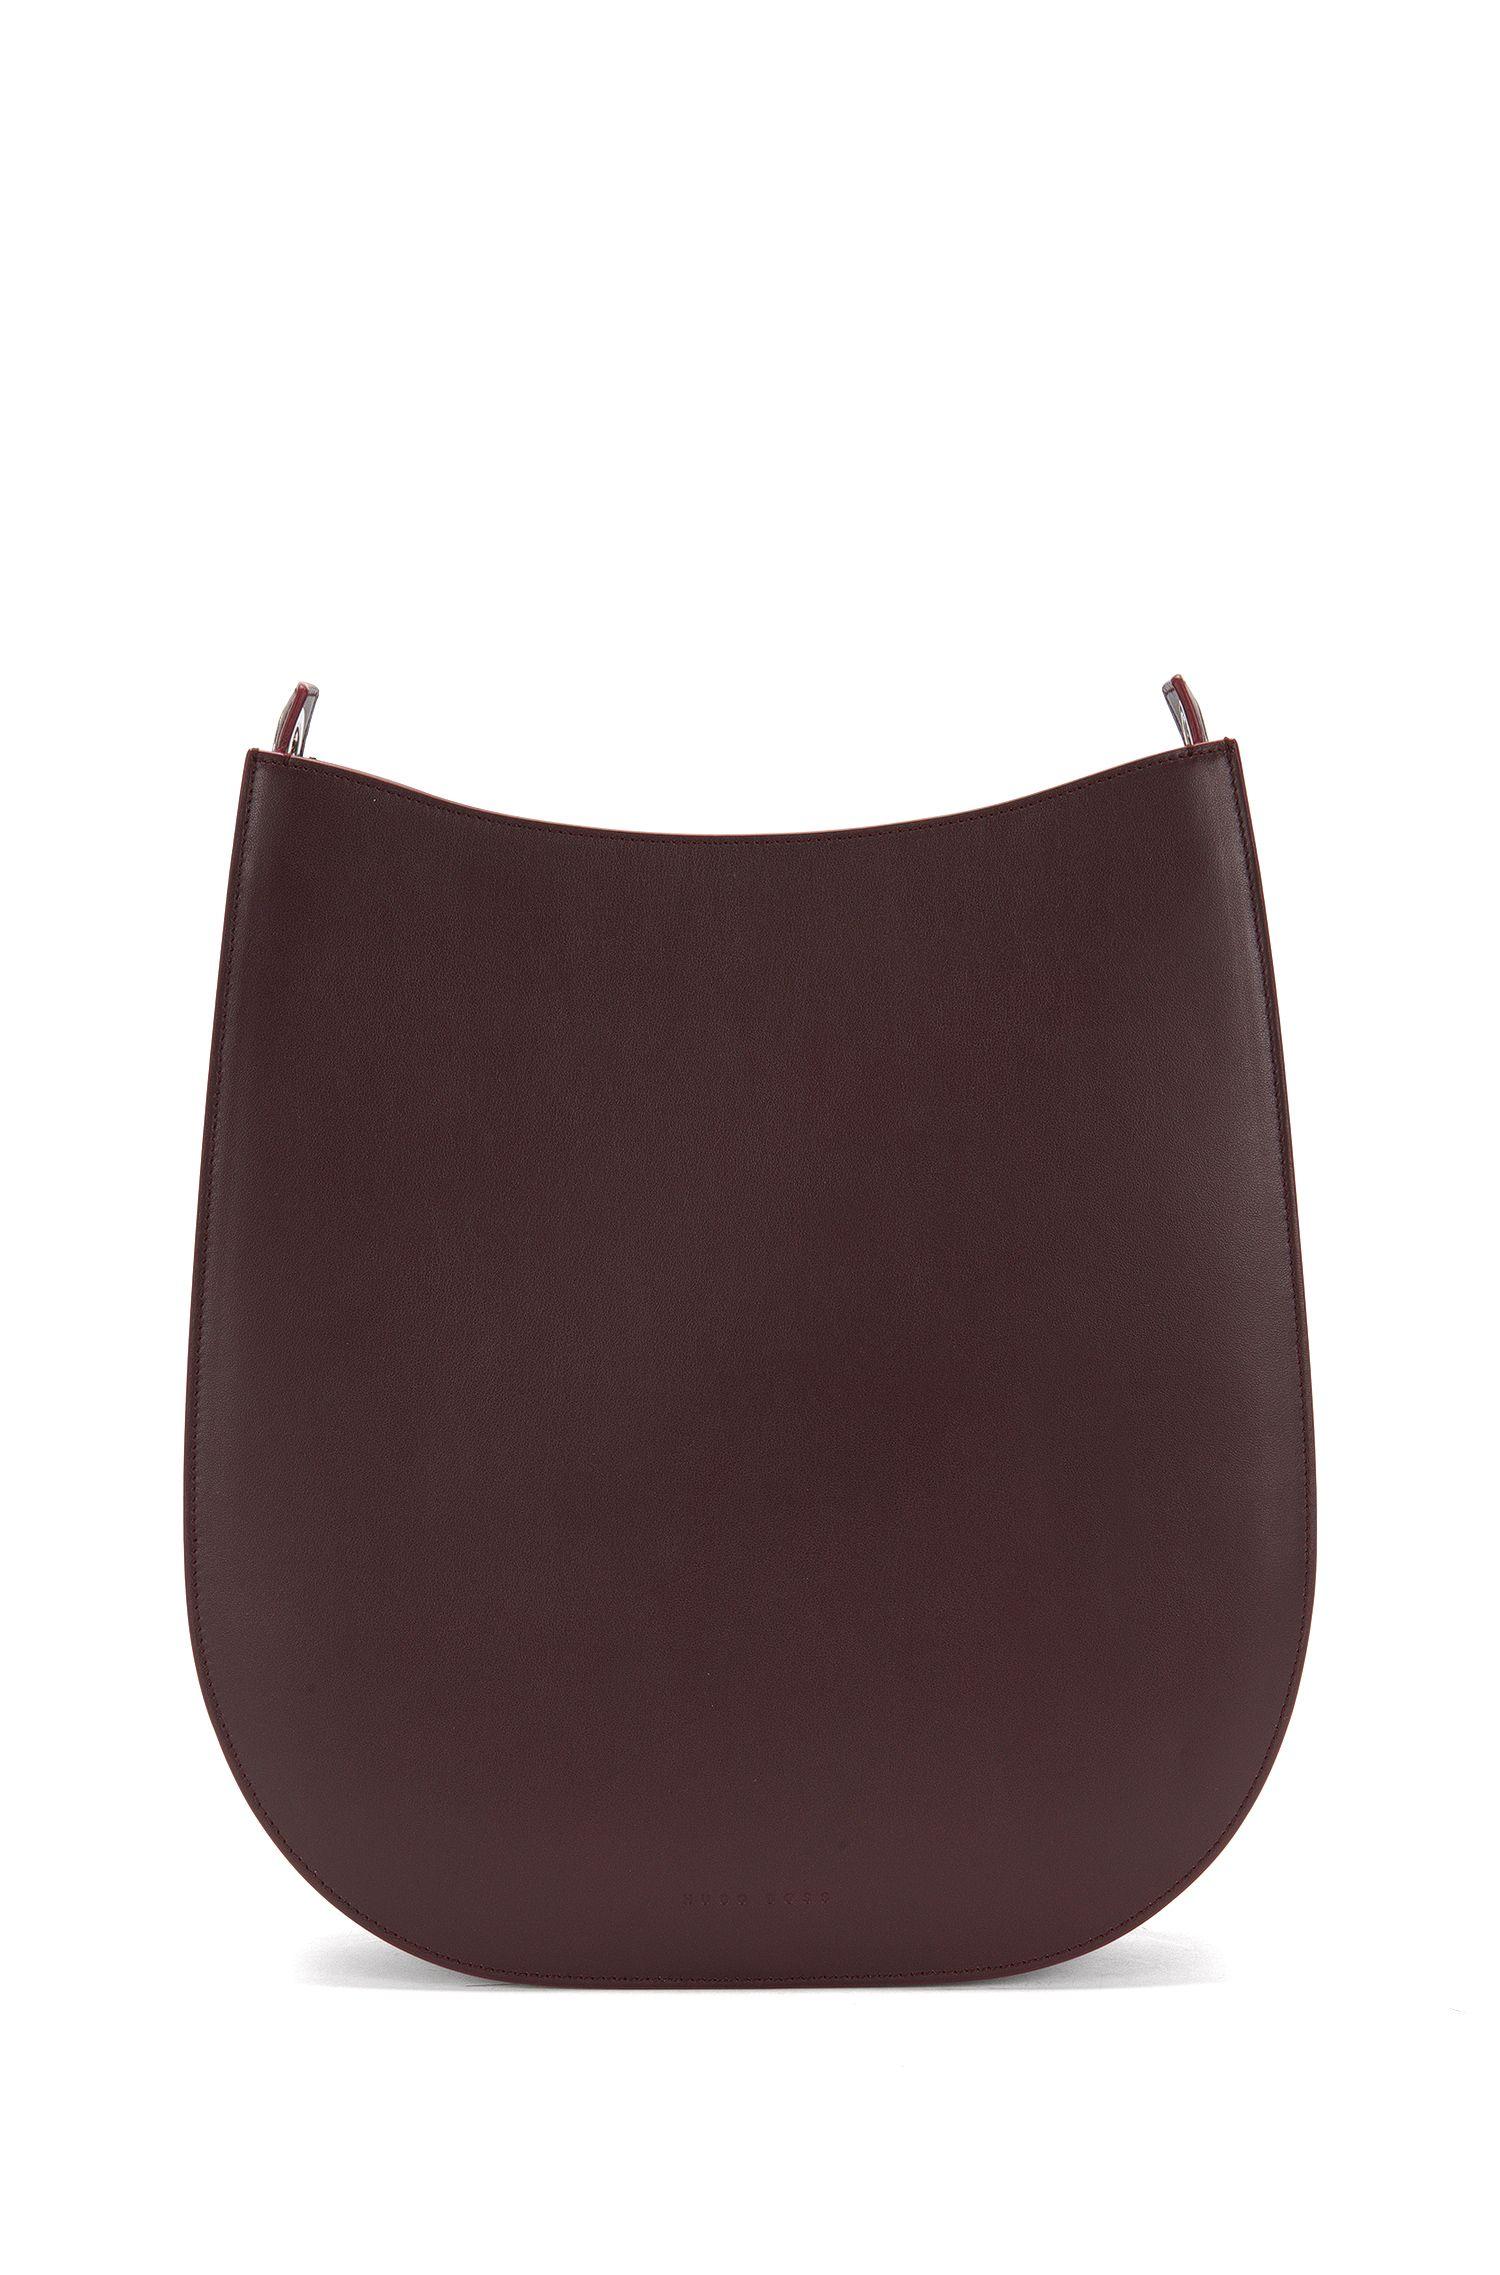 BOSS Bespoke hobo bag in leather